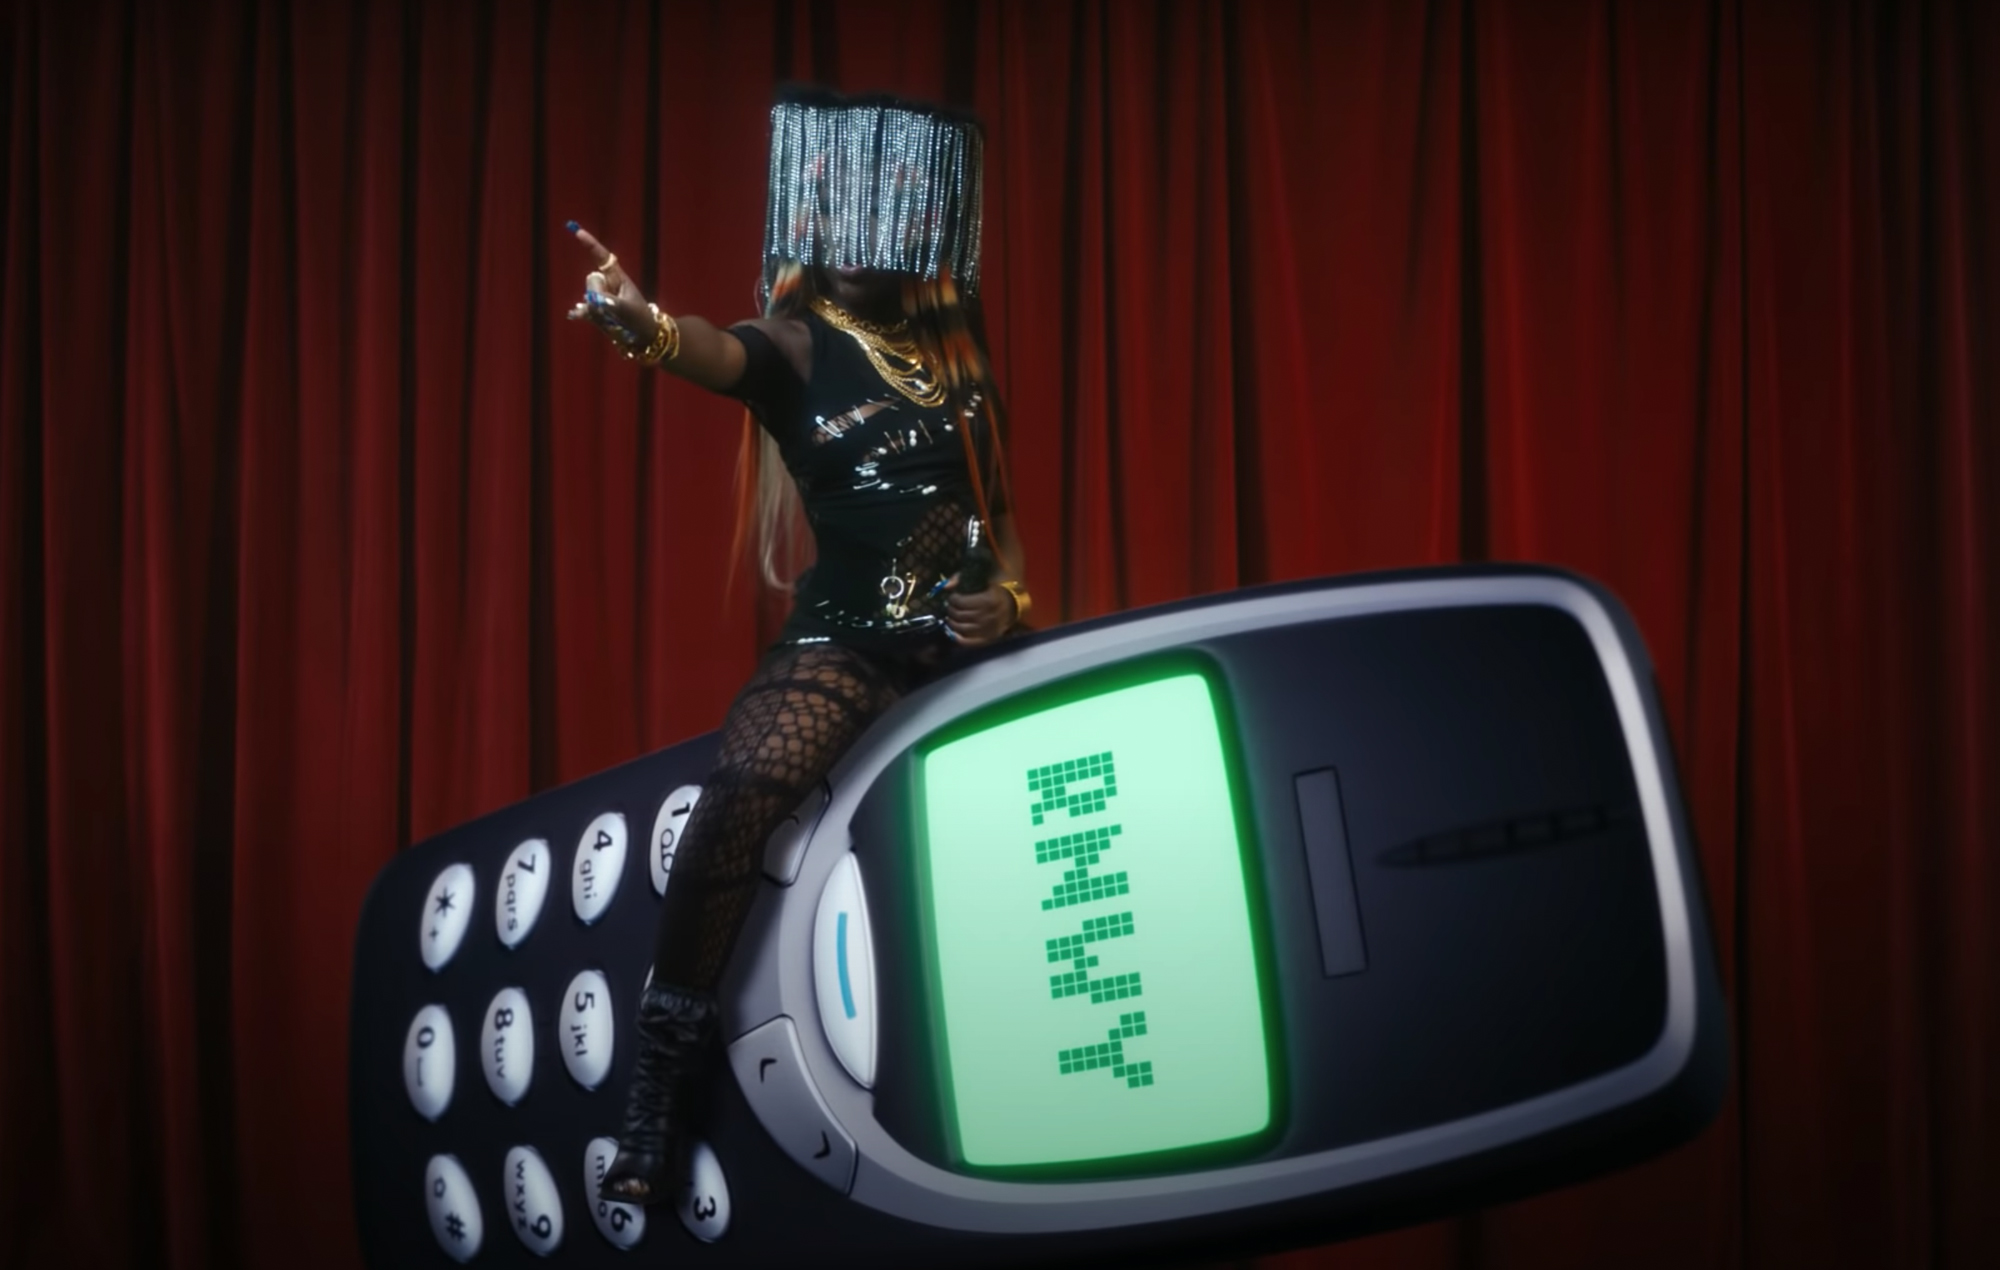 Bree Runway drops retro-inspired single 'Little Nokia'